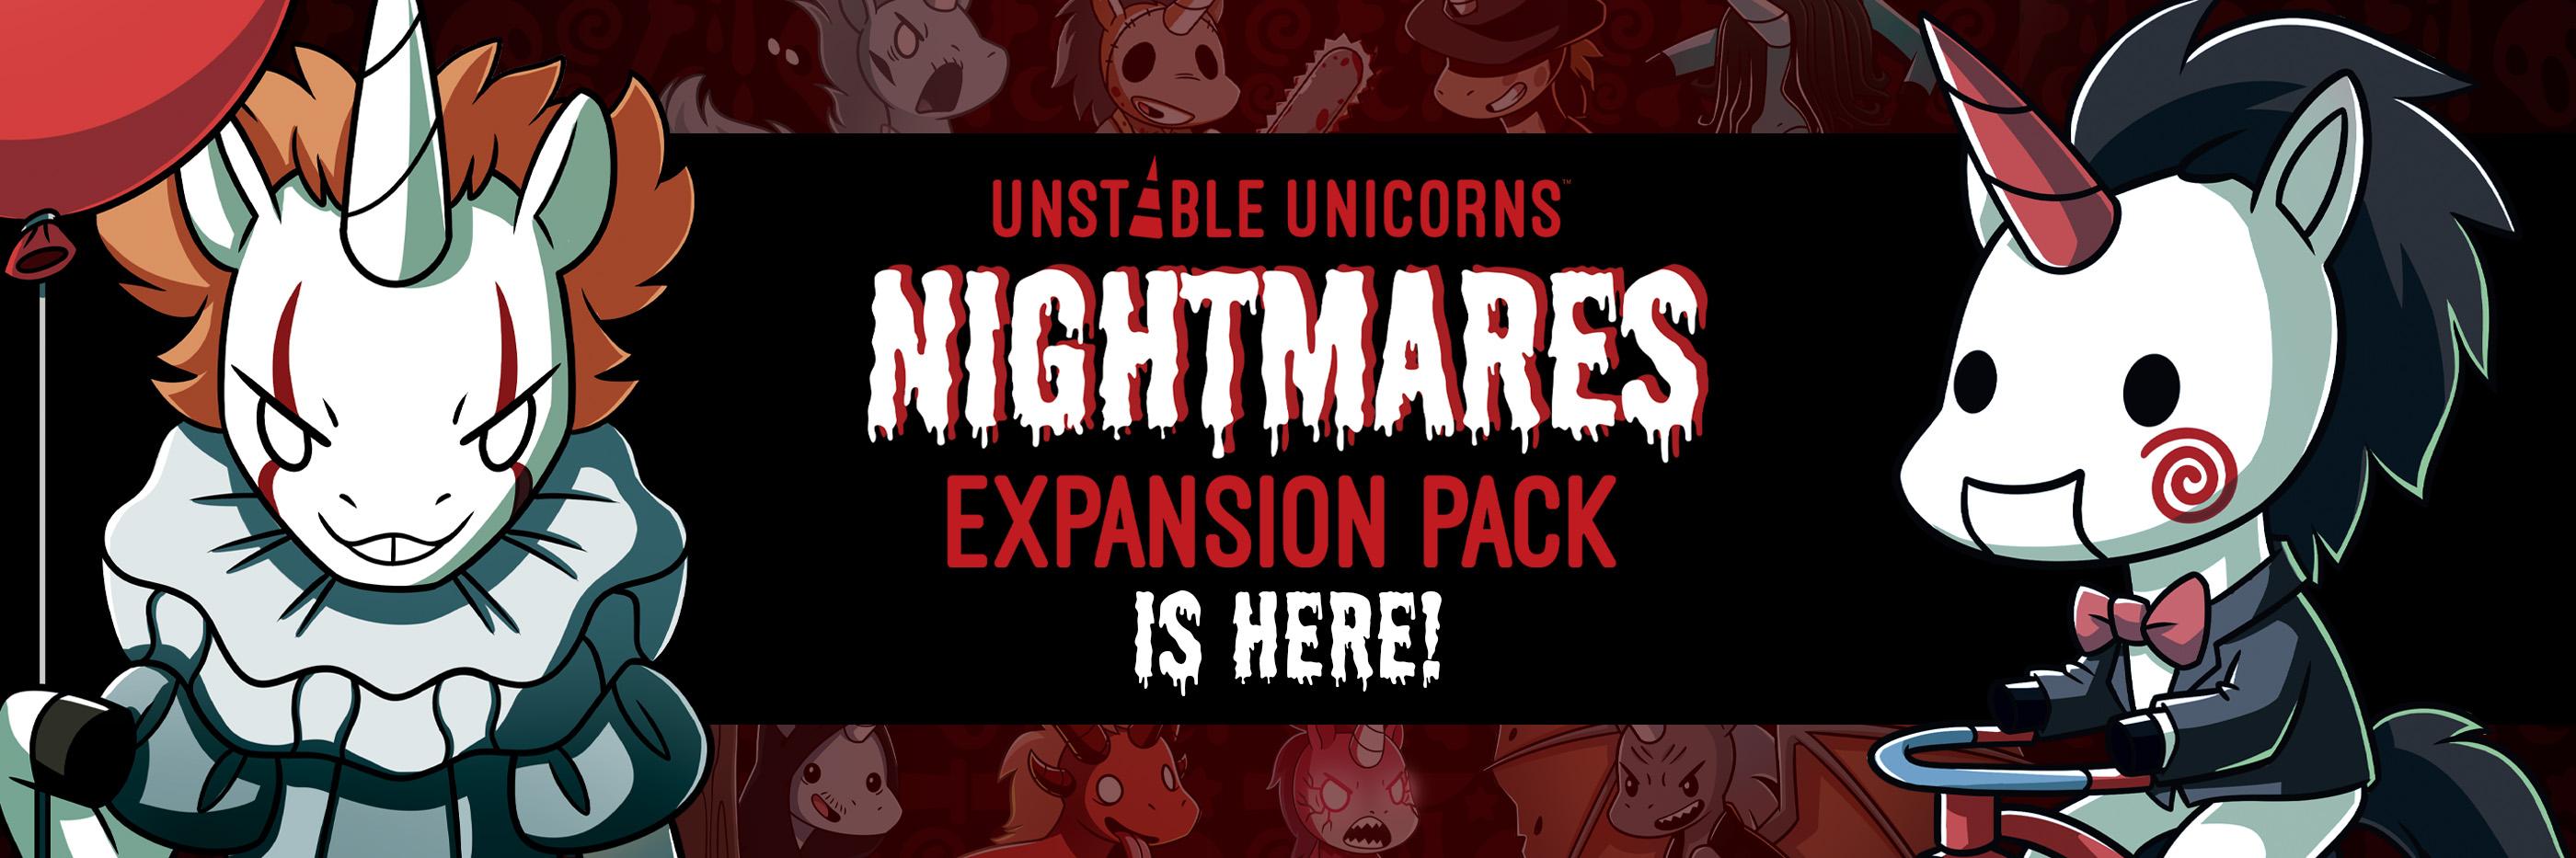 Unstable_Unicorns_Nightmares